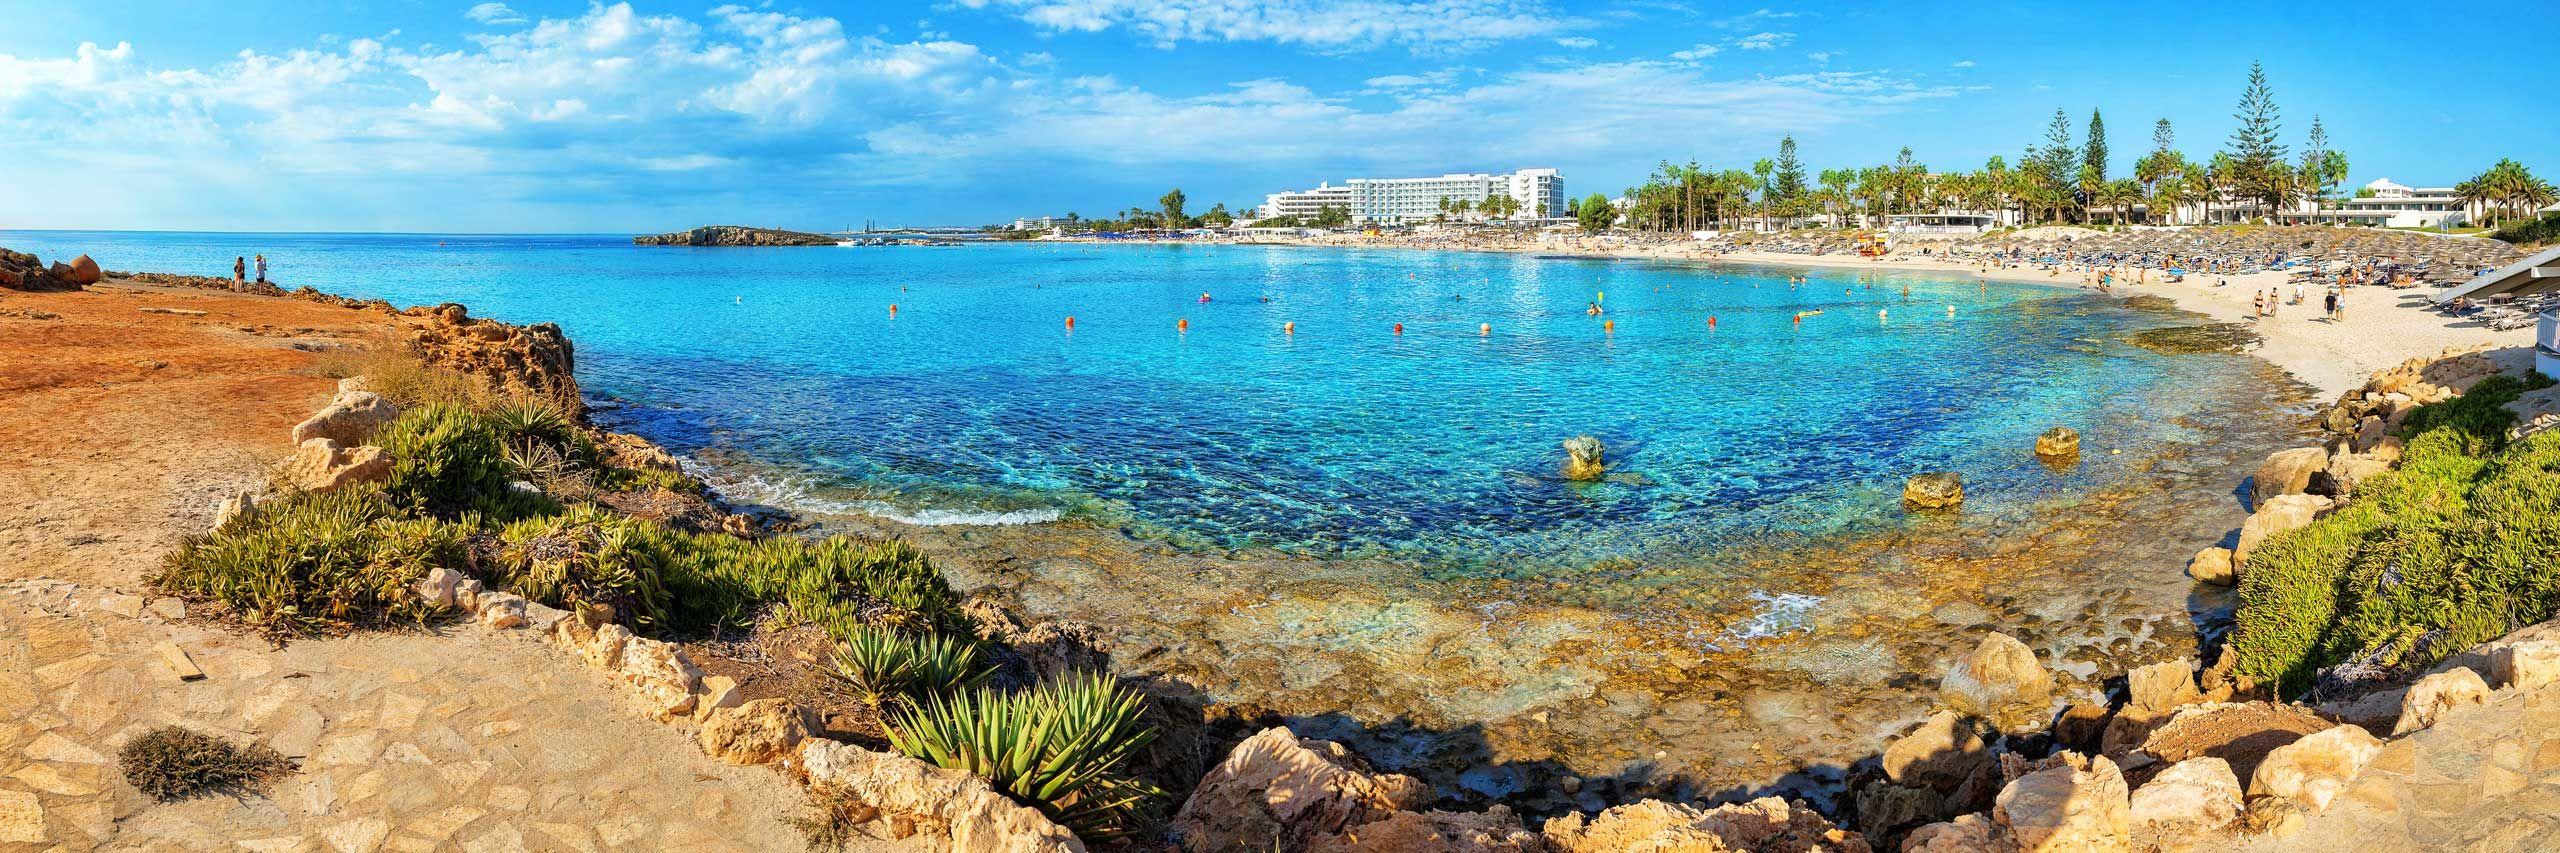 Zypern Ayia Napa Erfahrungsbericht